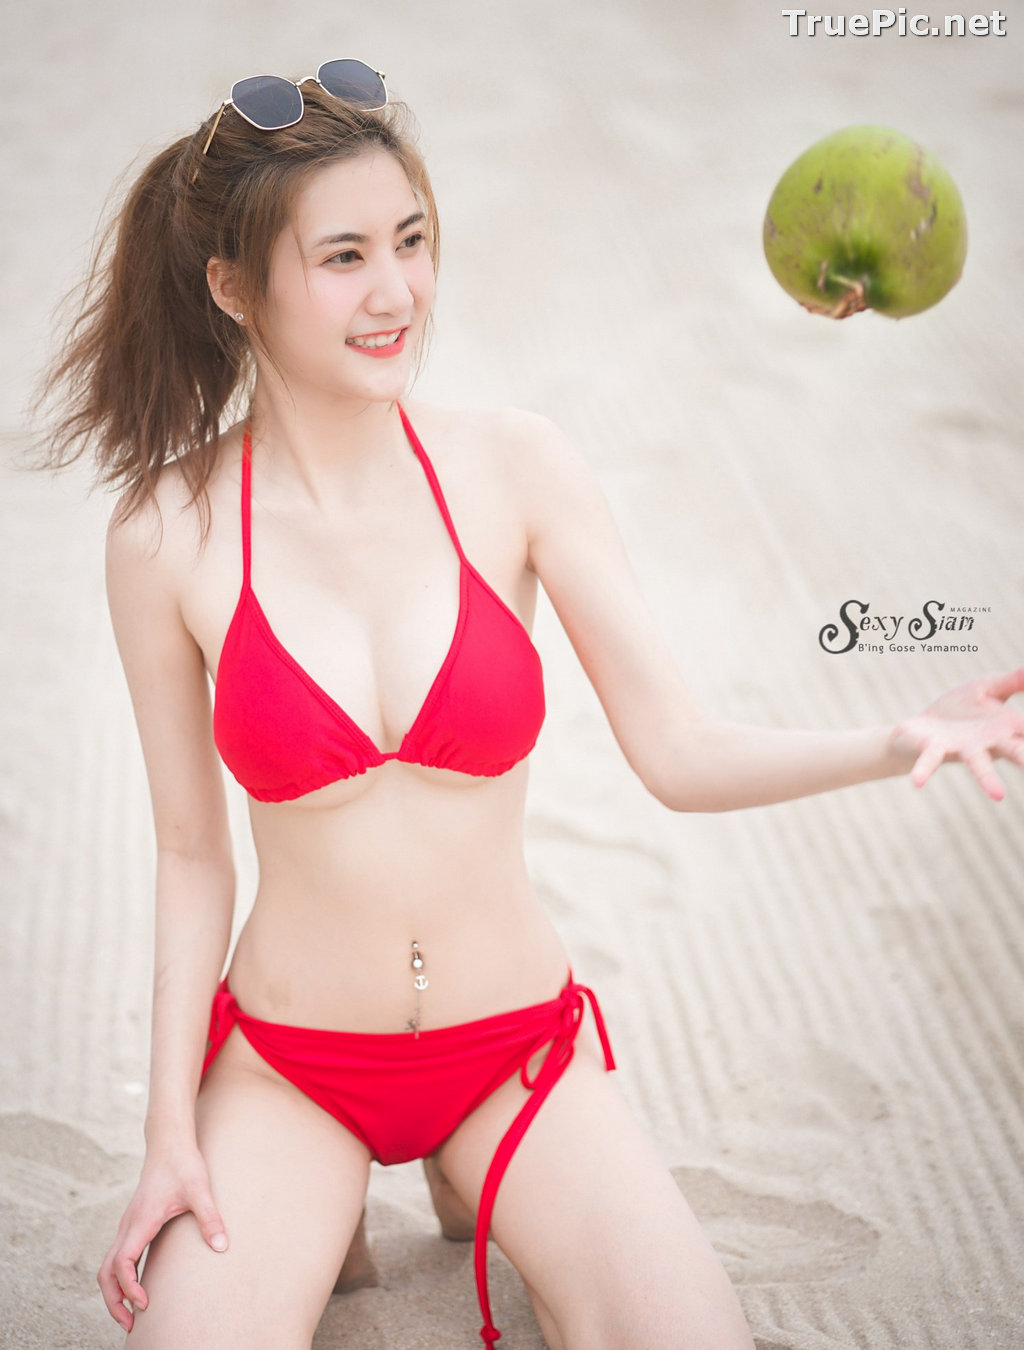 Image Thailand Model - Nitchakan Thongruangkitti - Red Fern Bikini - TruePic.net - Picture-4